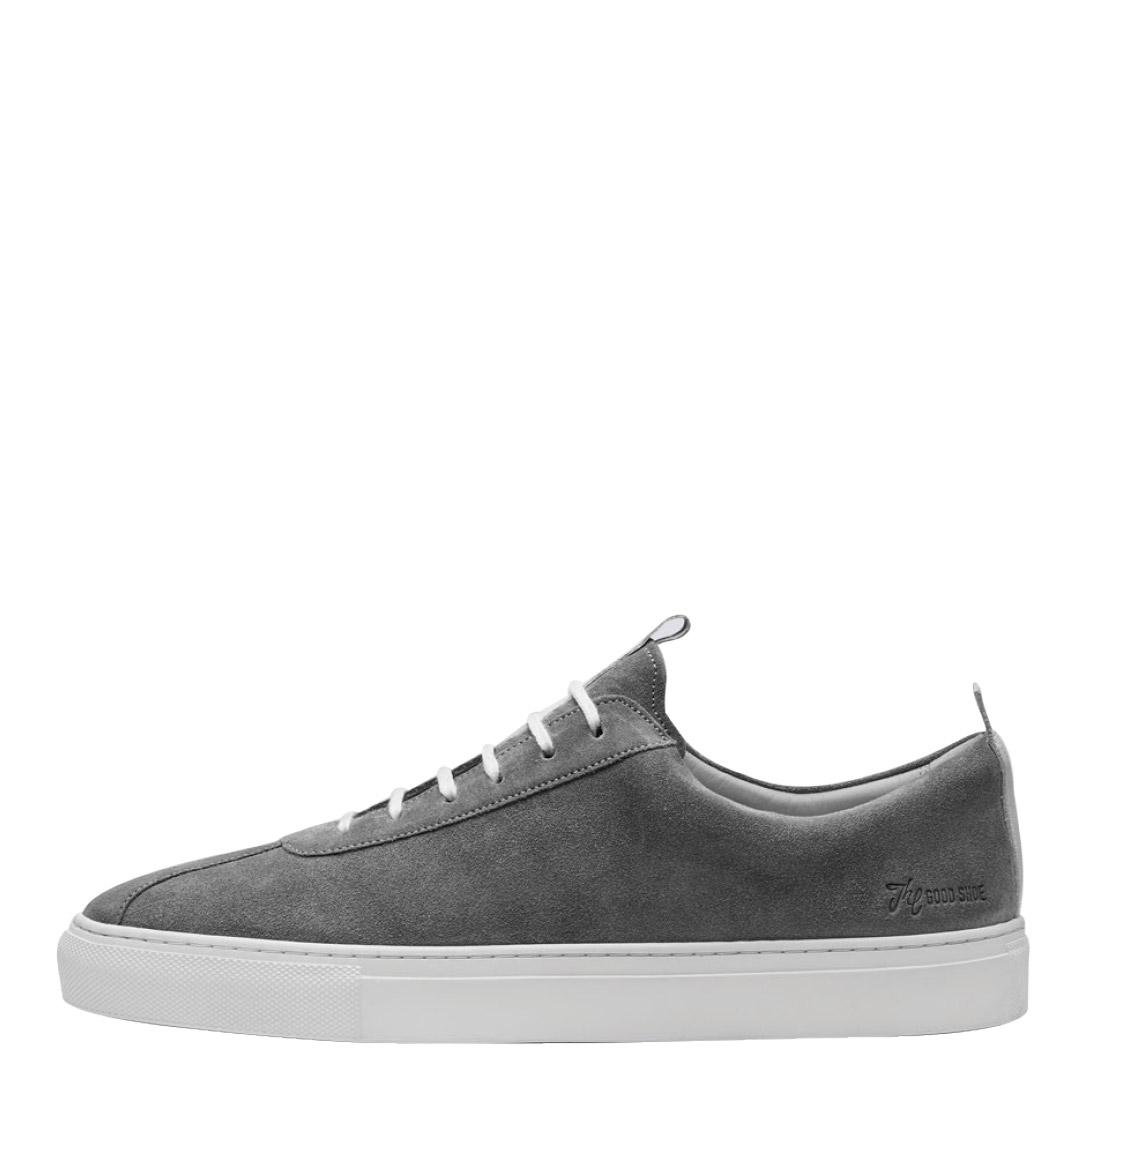 Grenson Ash Suede Oxford Sneaker